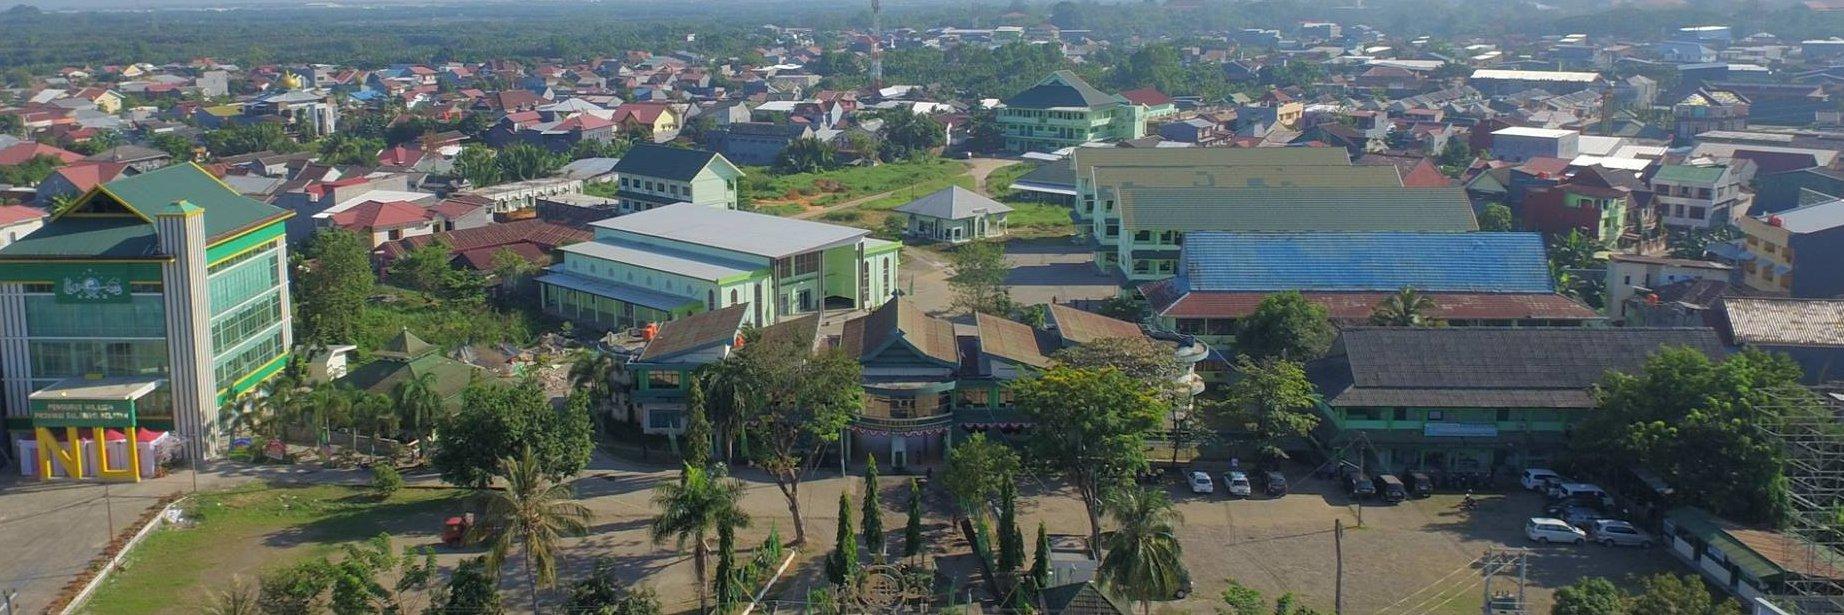 Universitas Islam Makassar's official Twitter account